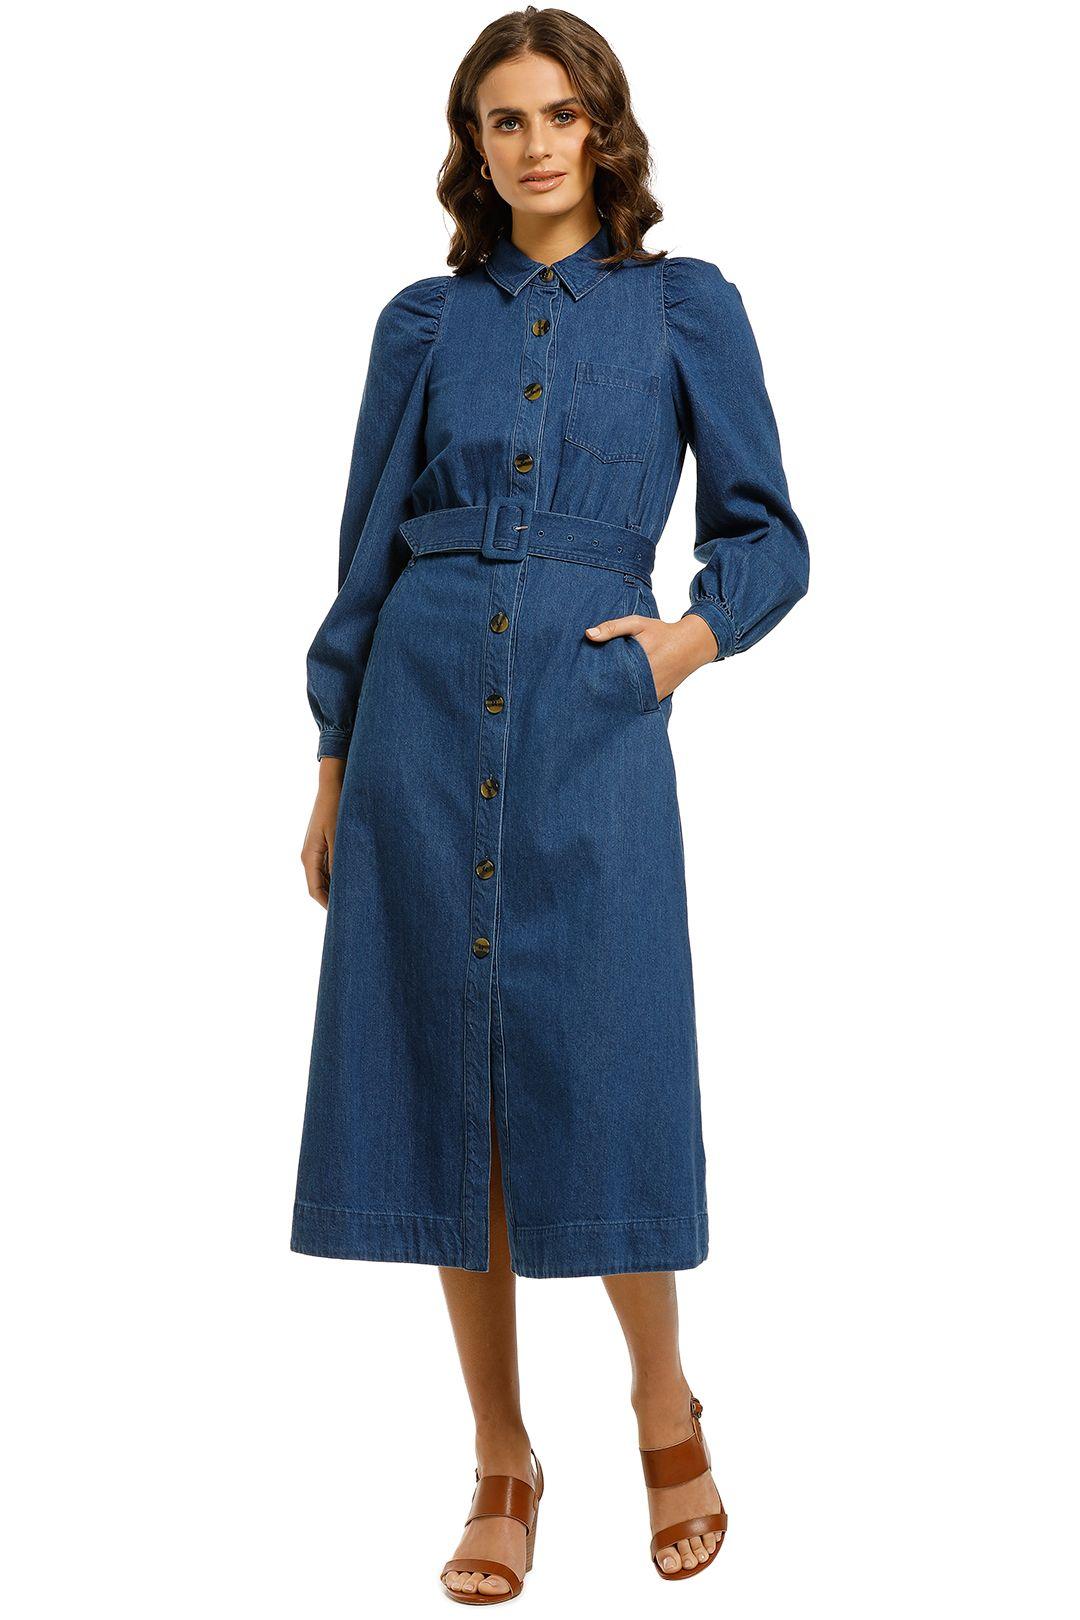 Whistles-Denim-Midi-Shirt-Dress-Front